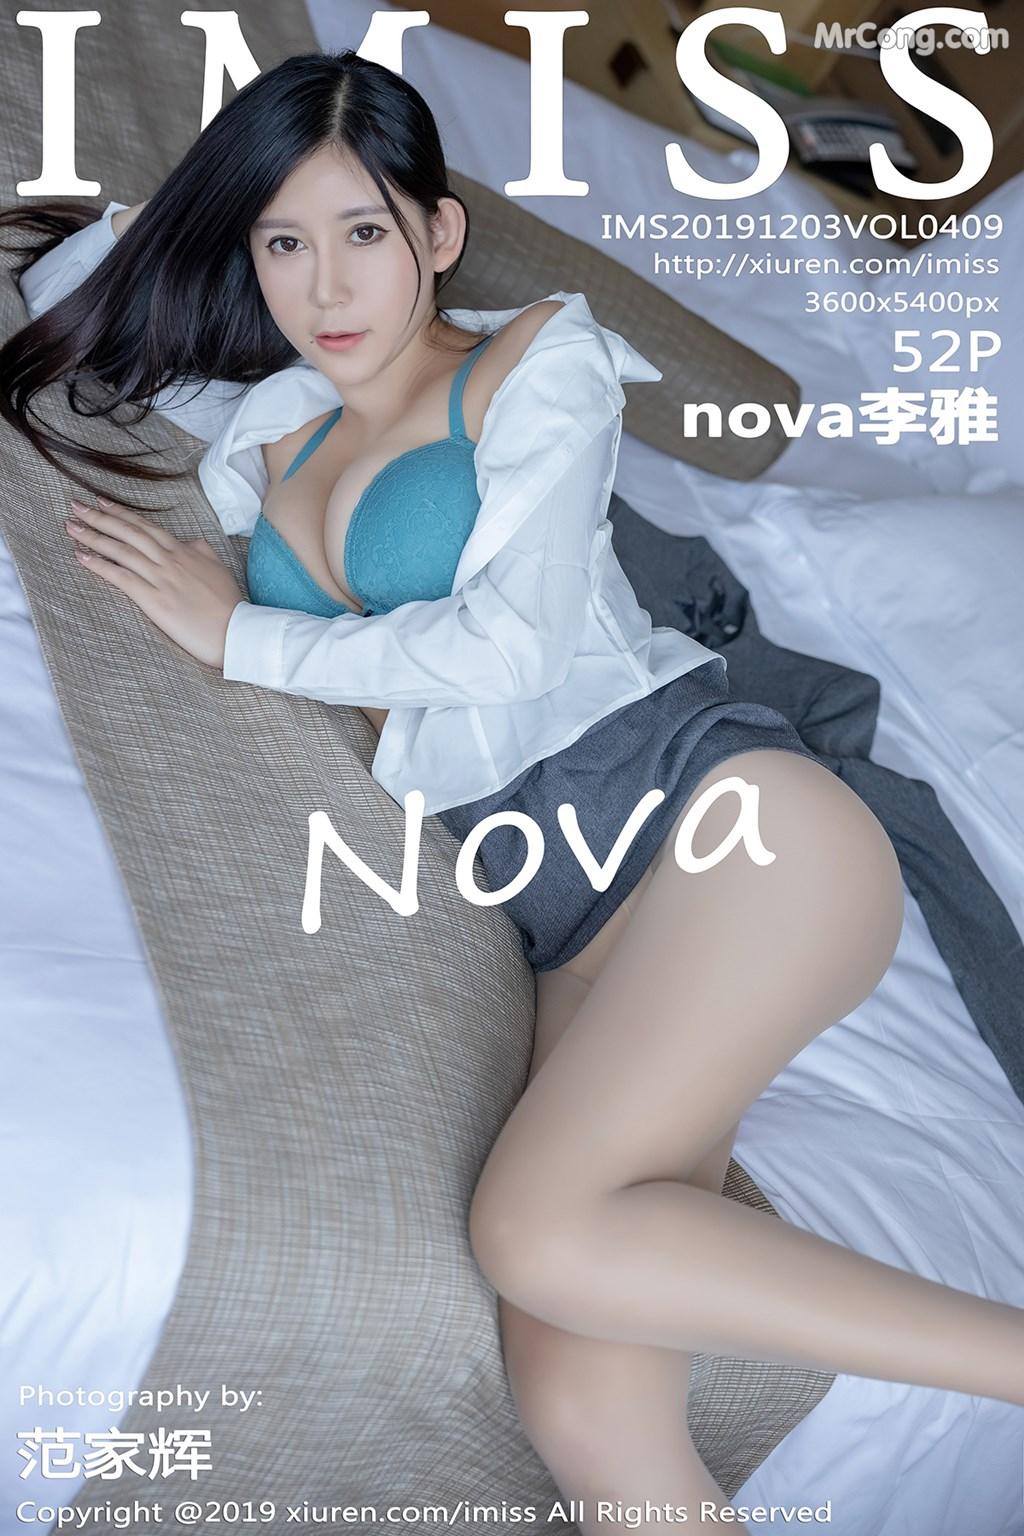 IMISS Vol.409: nova李雅 (53 ảnh)